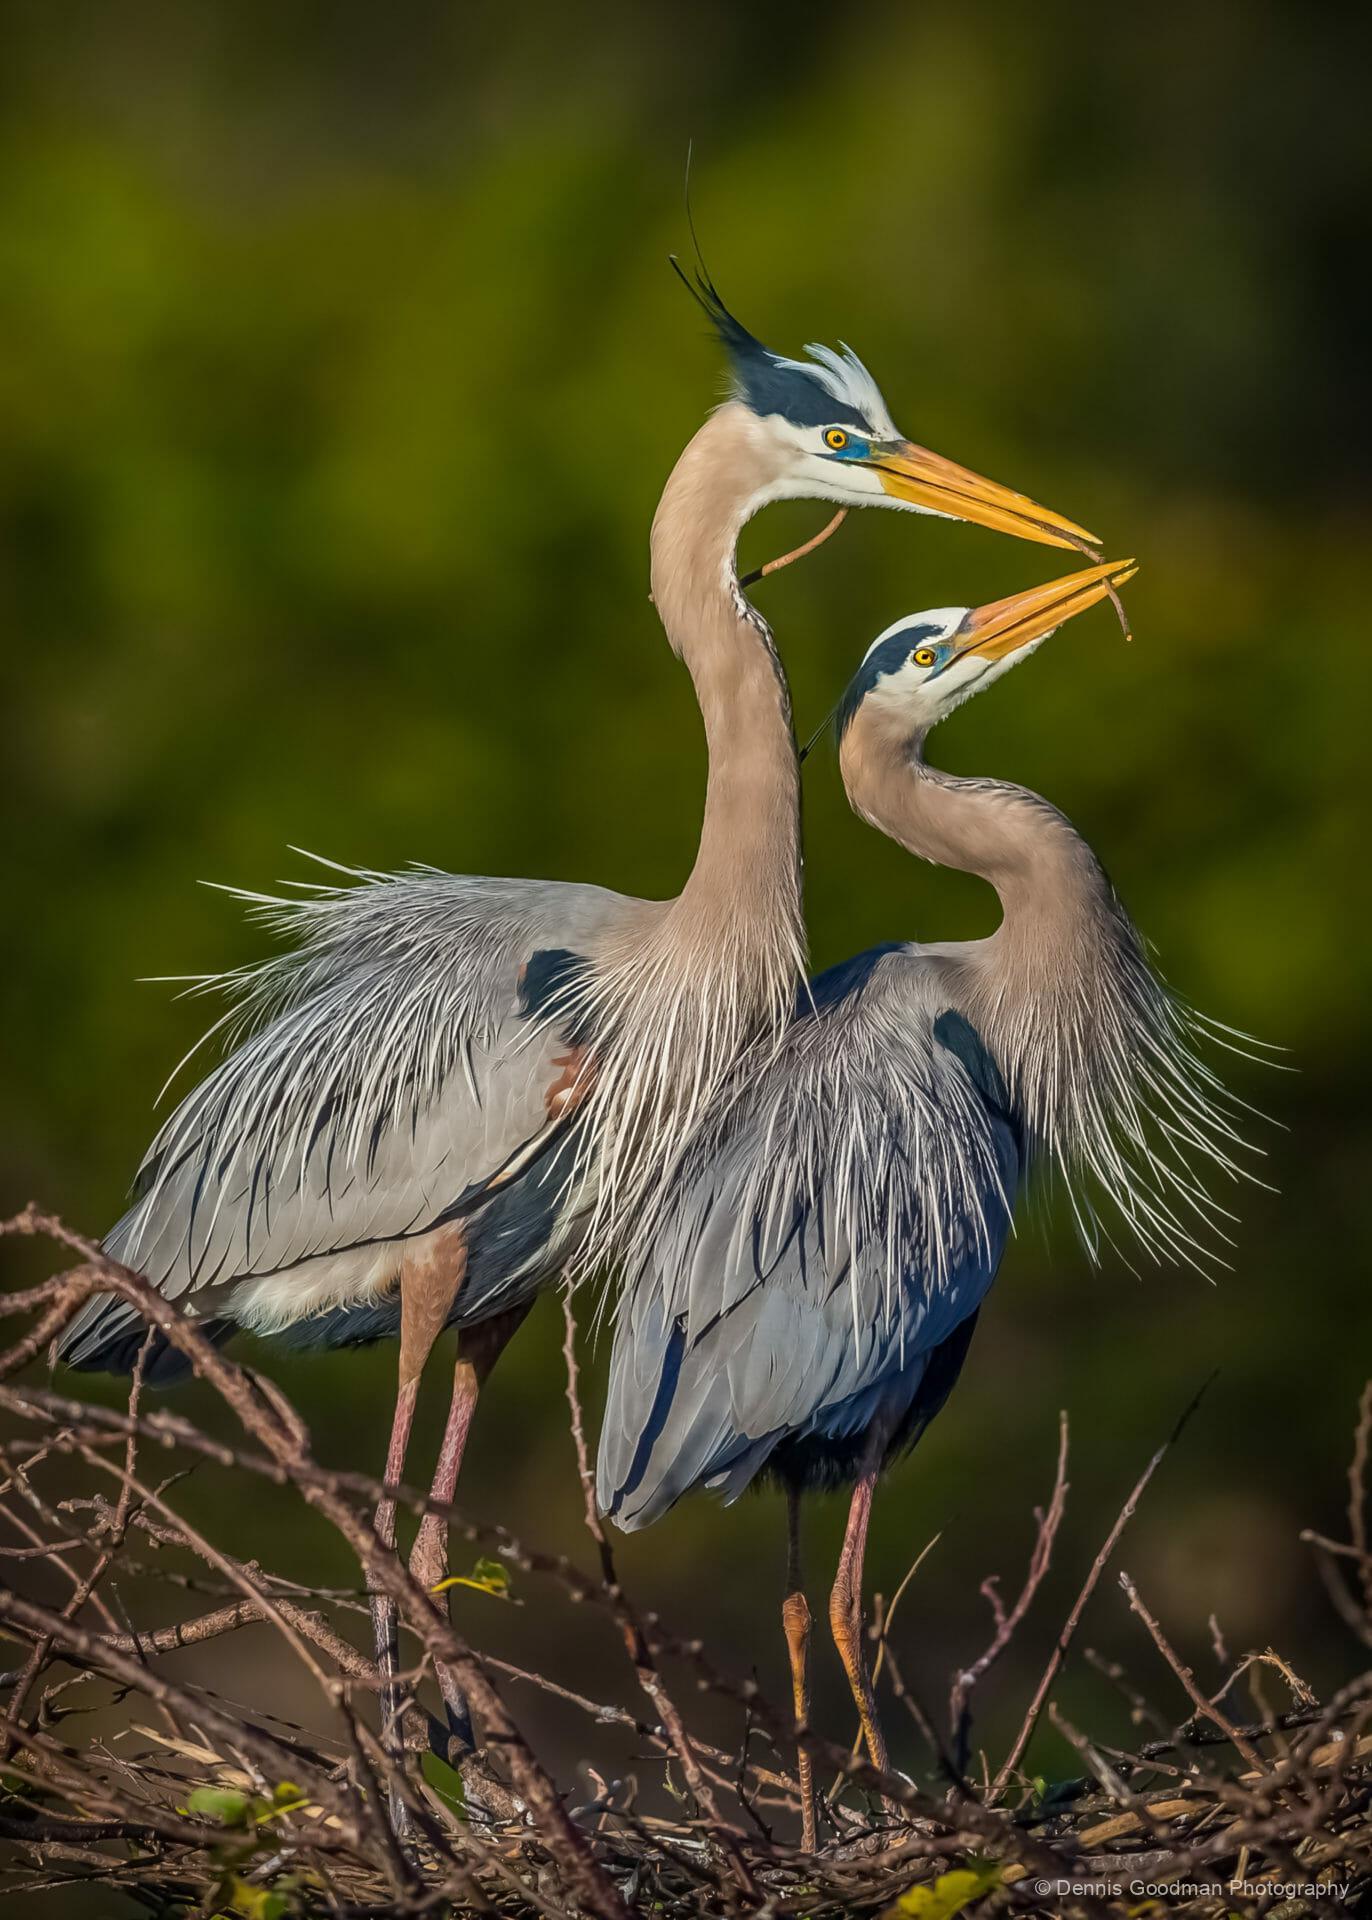 Blue Heron 1 - Dennis Goodman Photography & Printing